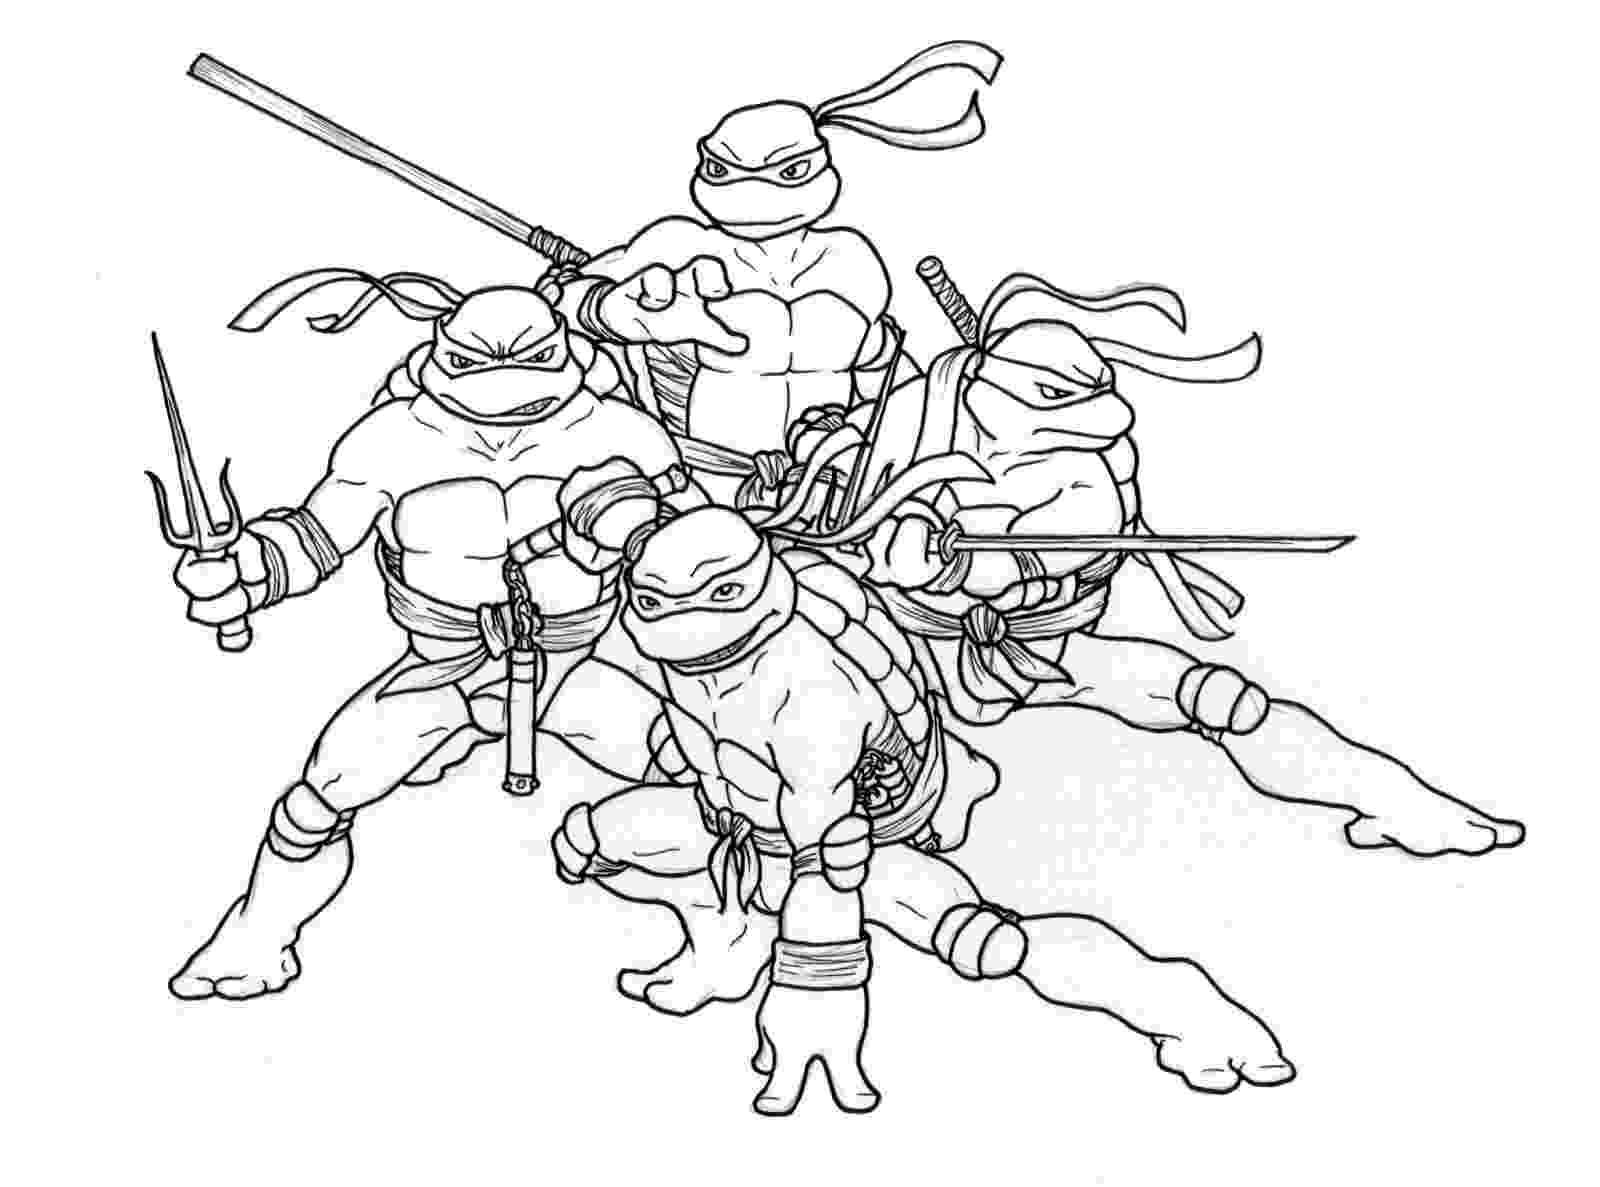 coloring book pages teenage mutant ninja turtles ninja turtles coloring pages kidsuki pages teenage mutant book ninja turtles coloring